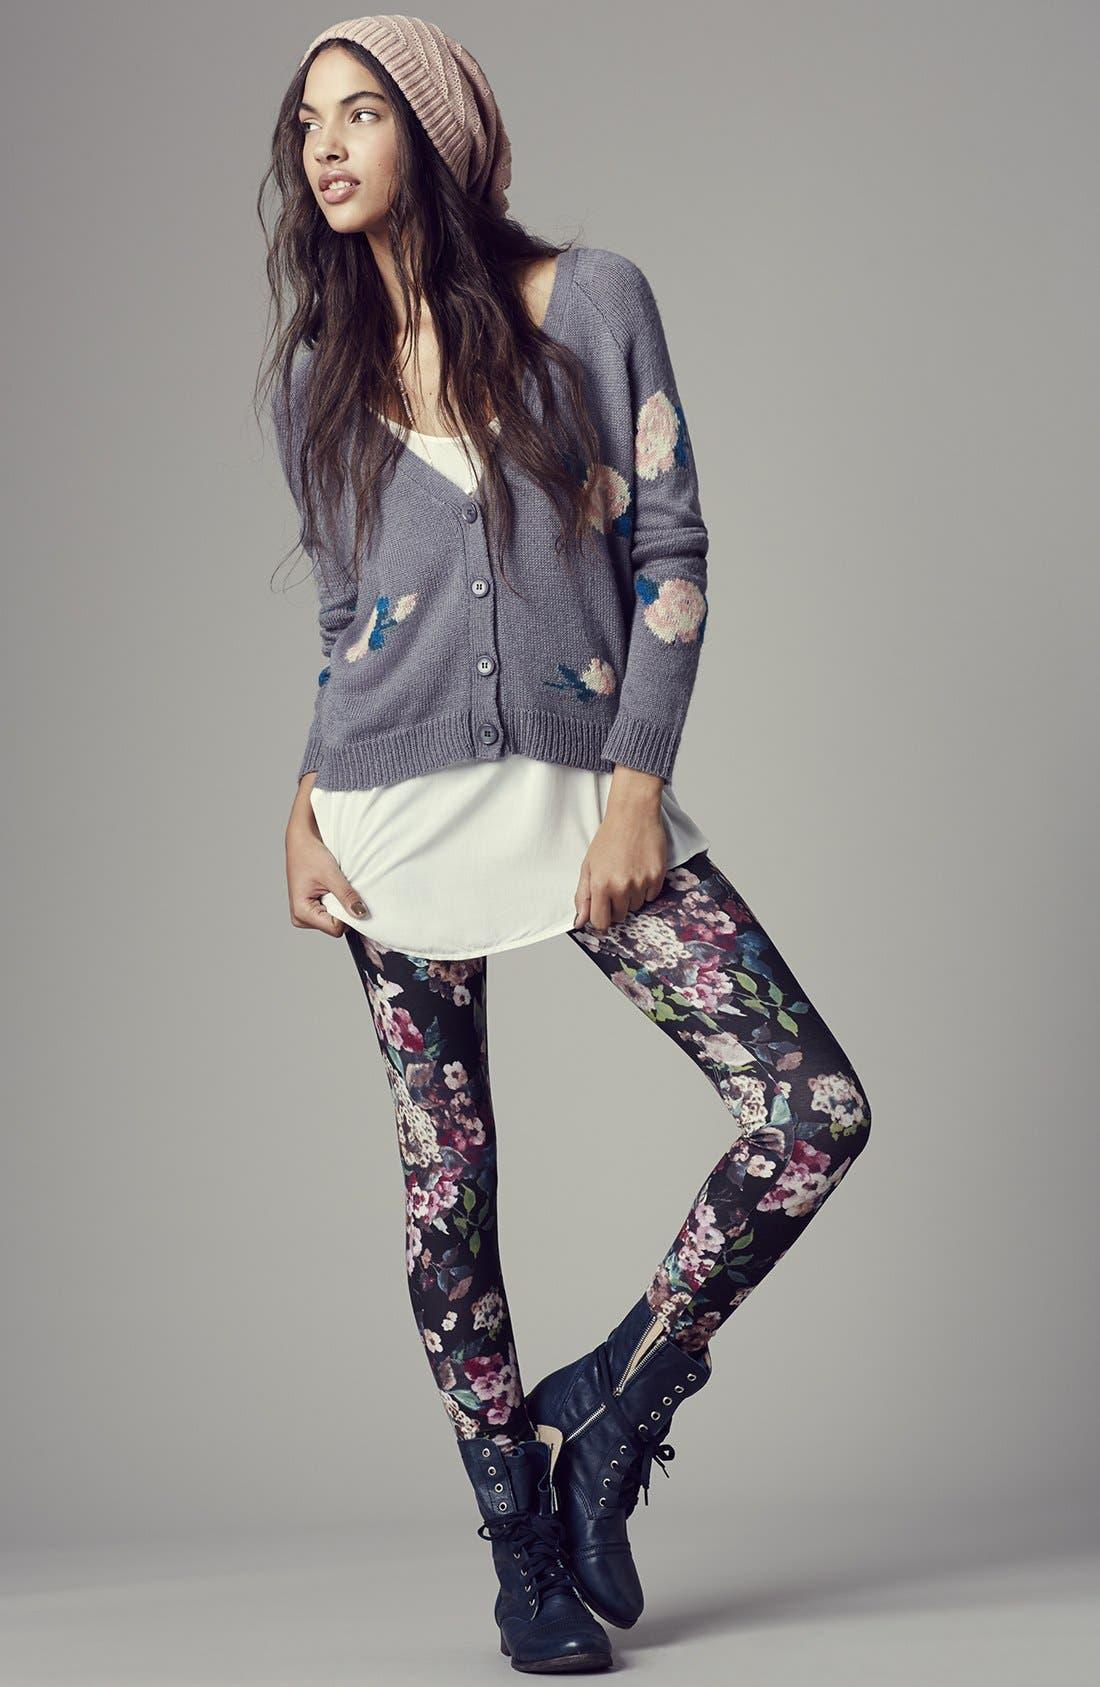 Main Image - Love by Design Cardigan, Rubbish® Tank & Mimi Chica Leggings